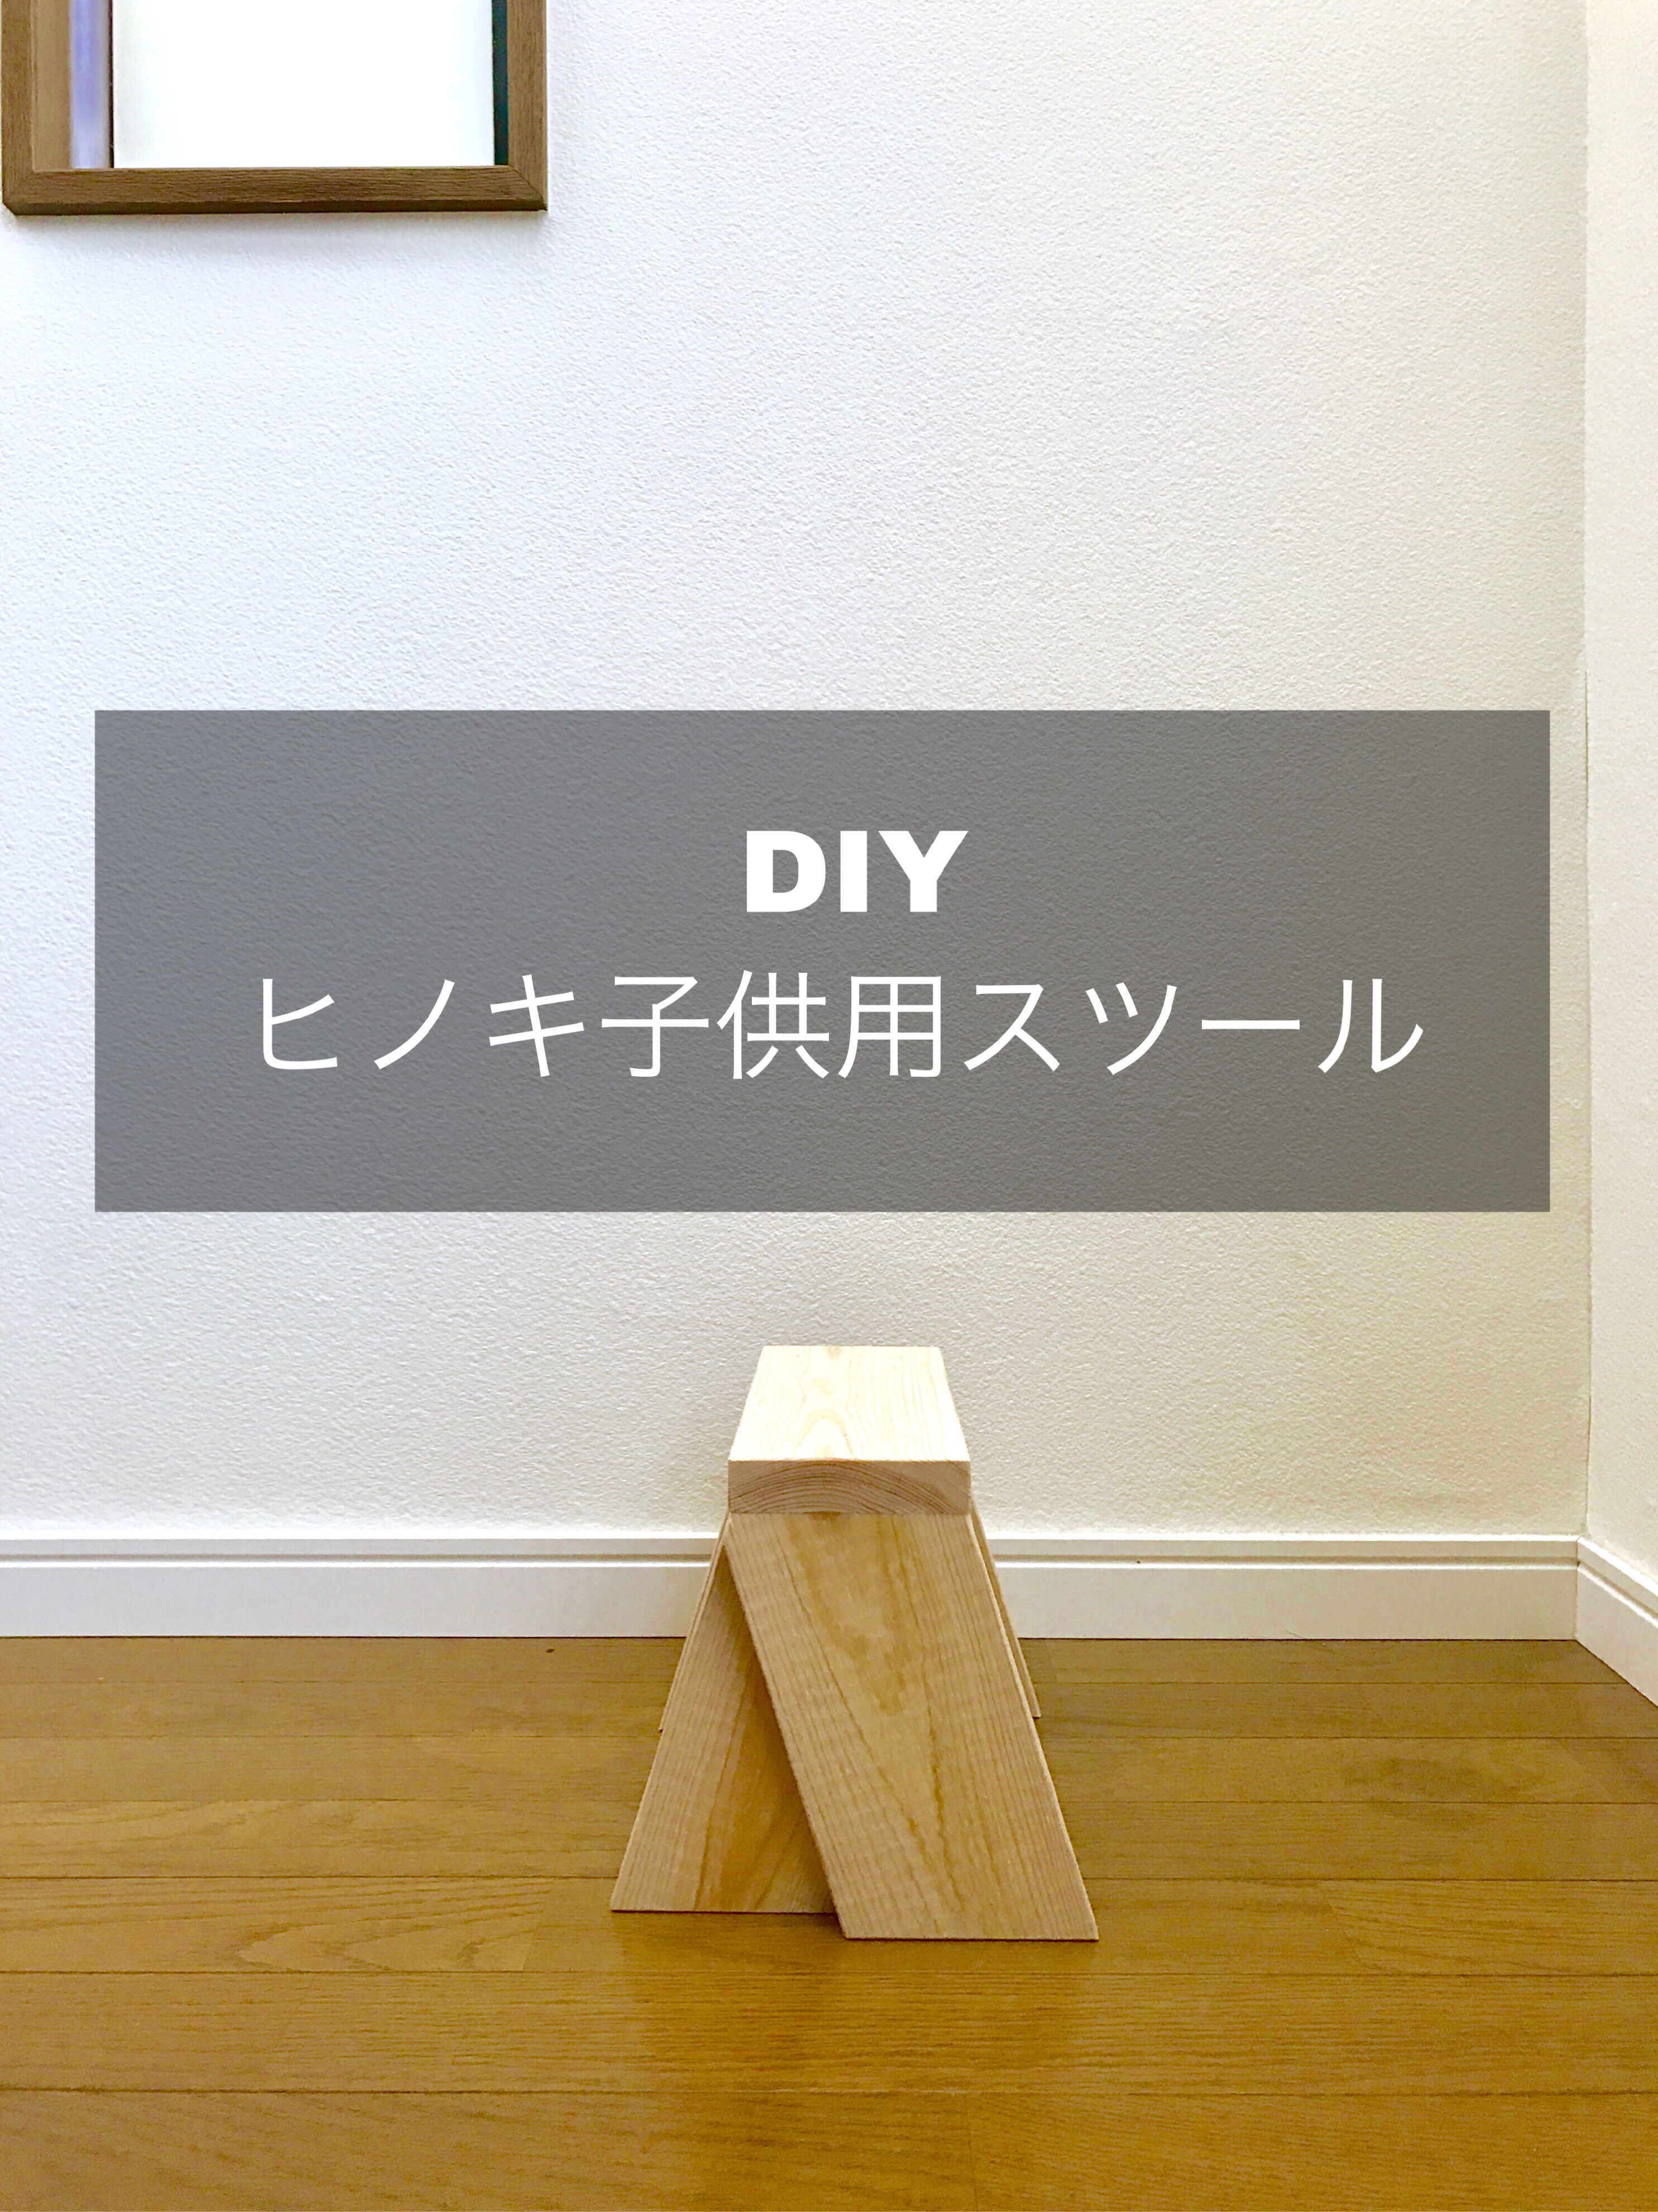 DIY ヒノキ 子供チェア